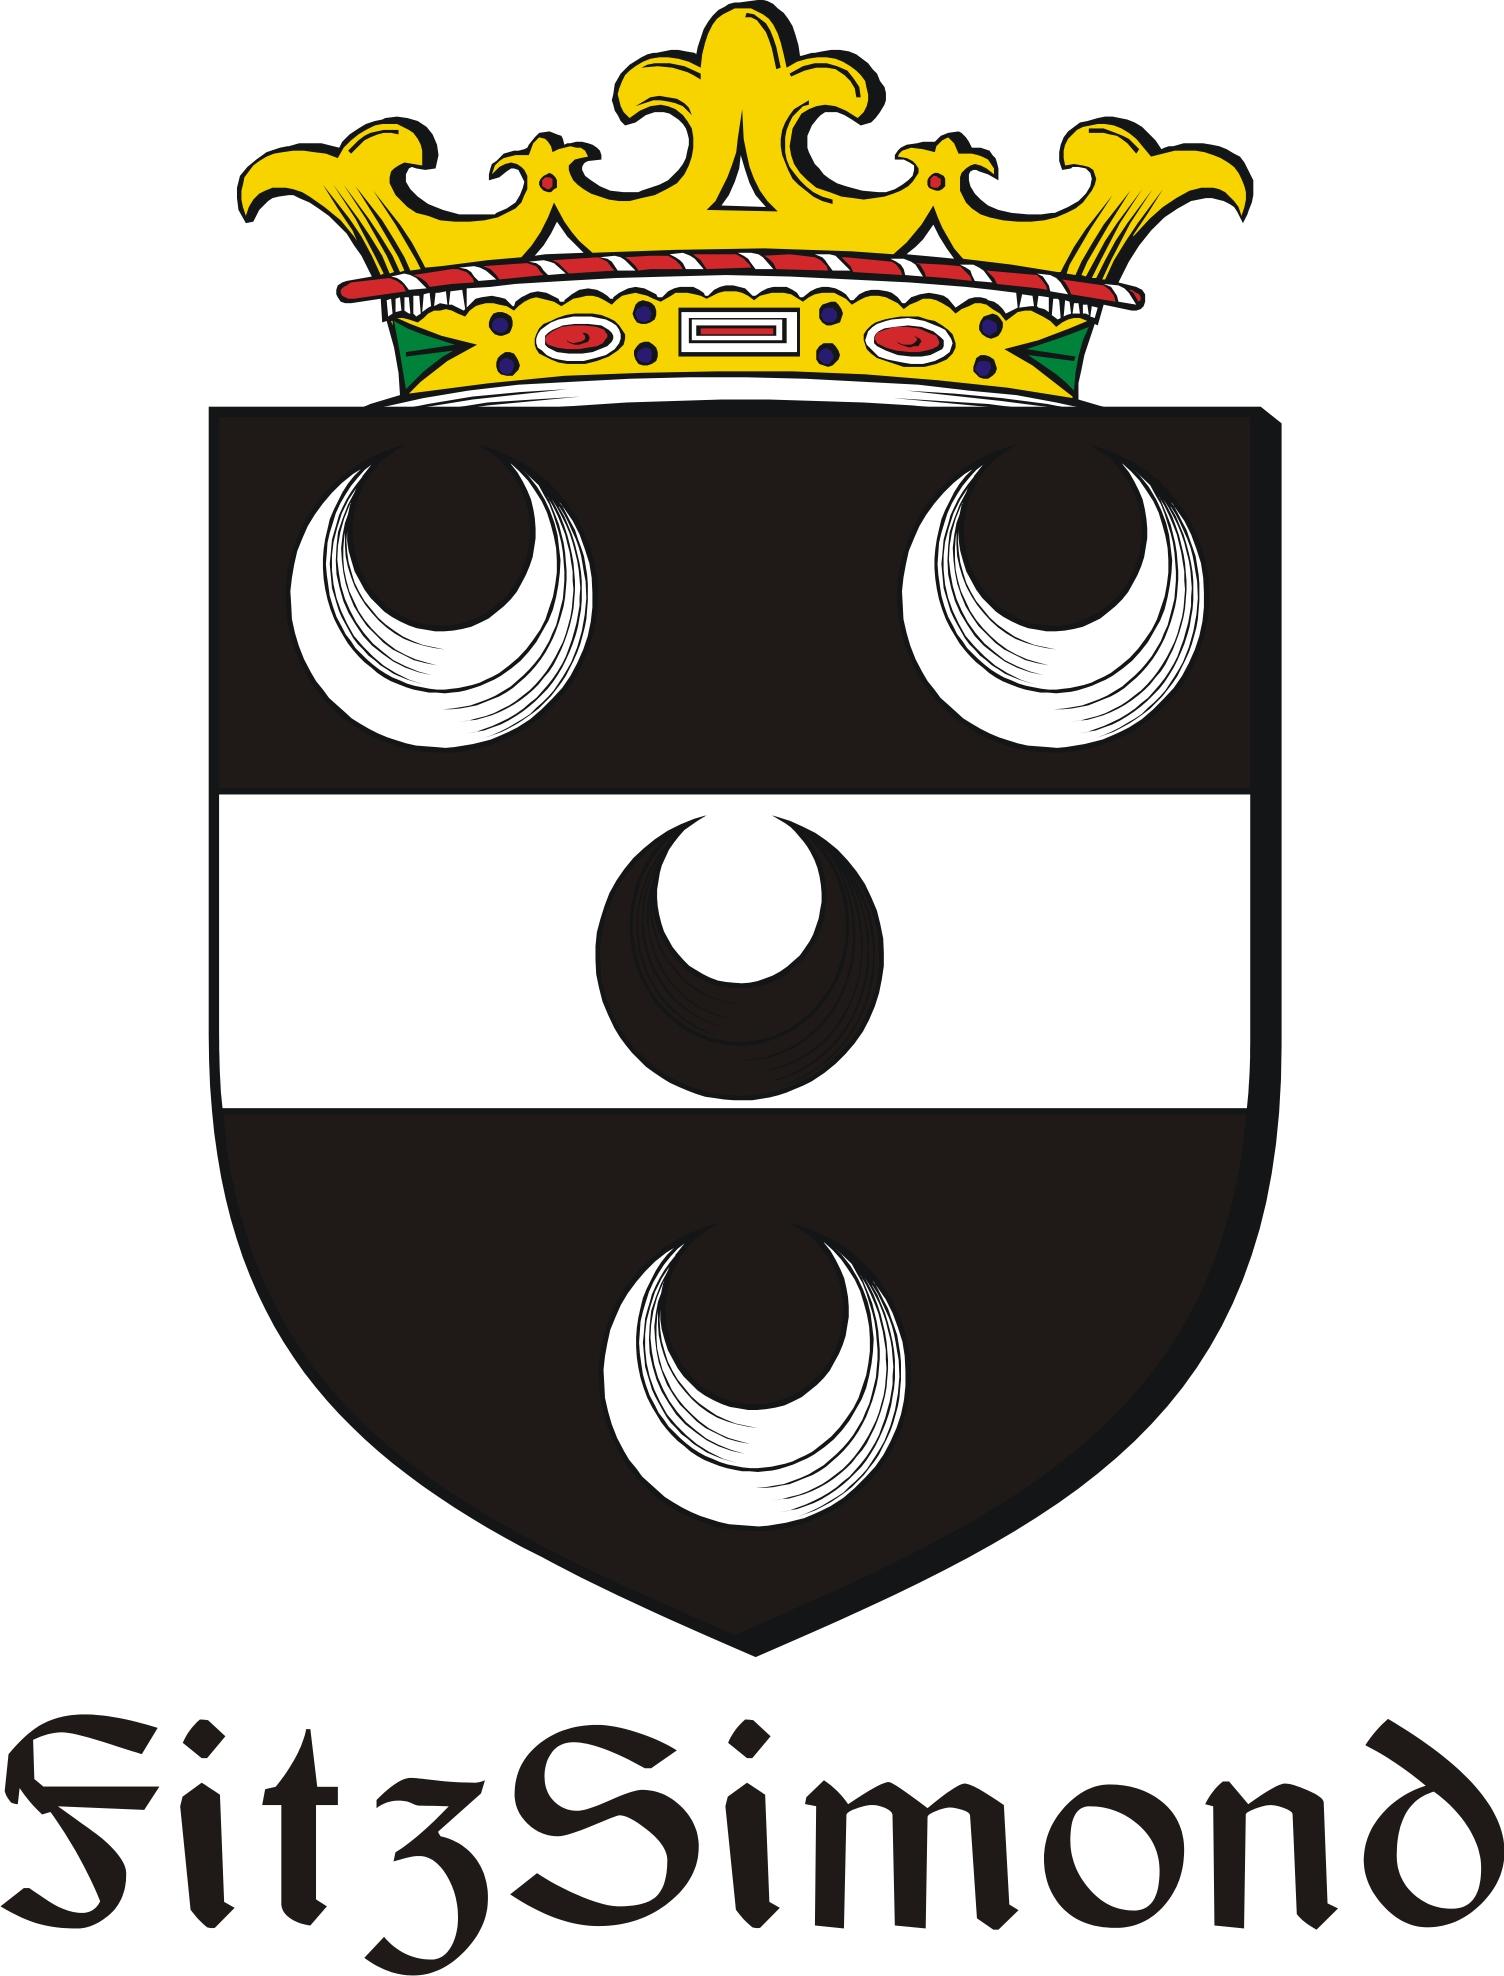 Thumbnail FitzSimond Family Crest / Irish Coat of Arms Image Download